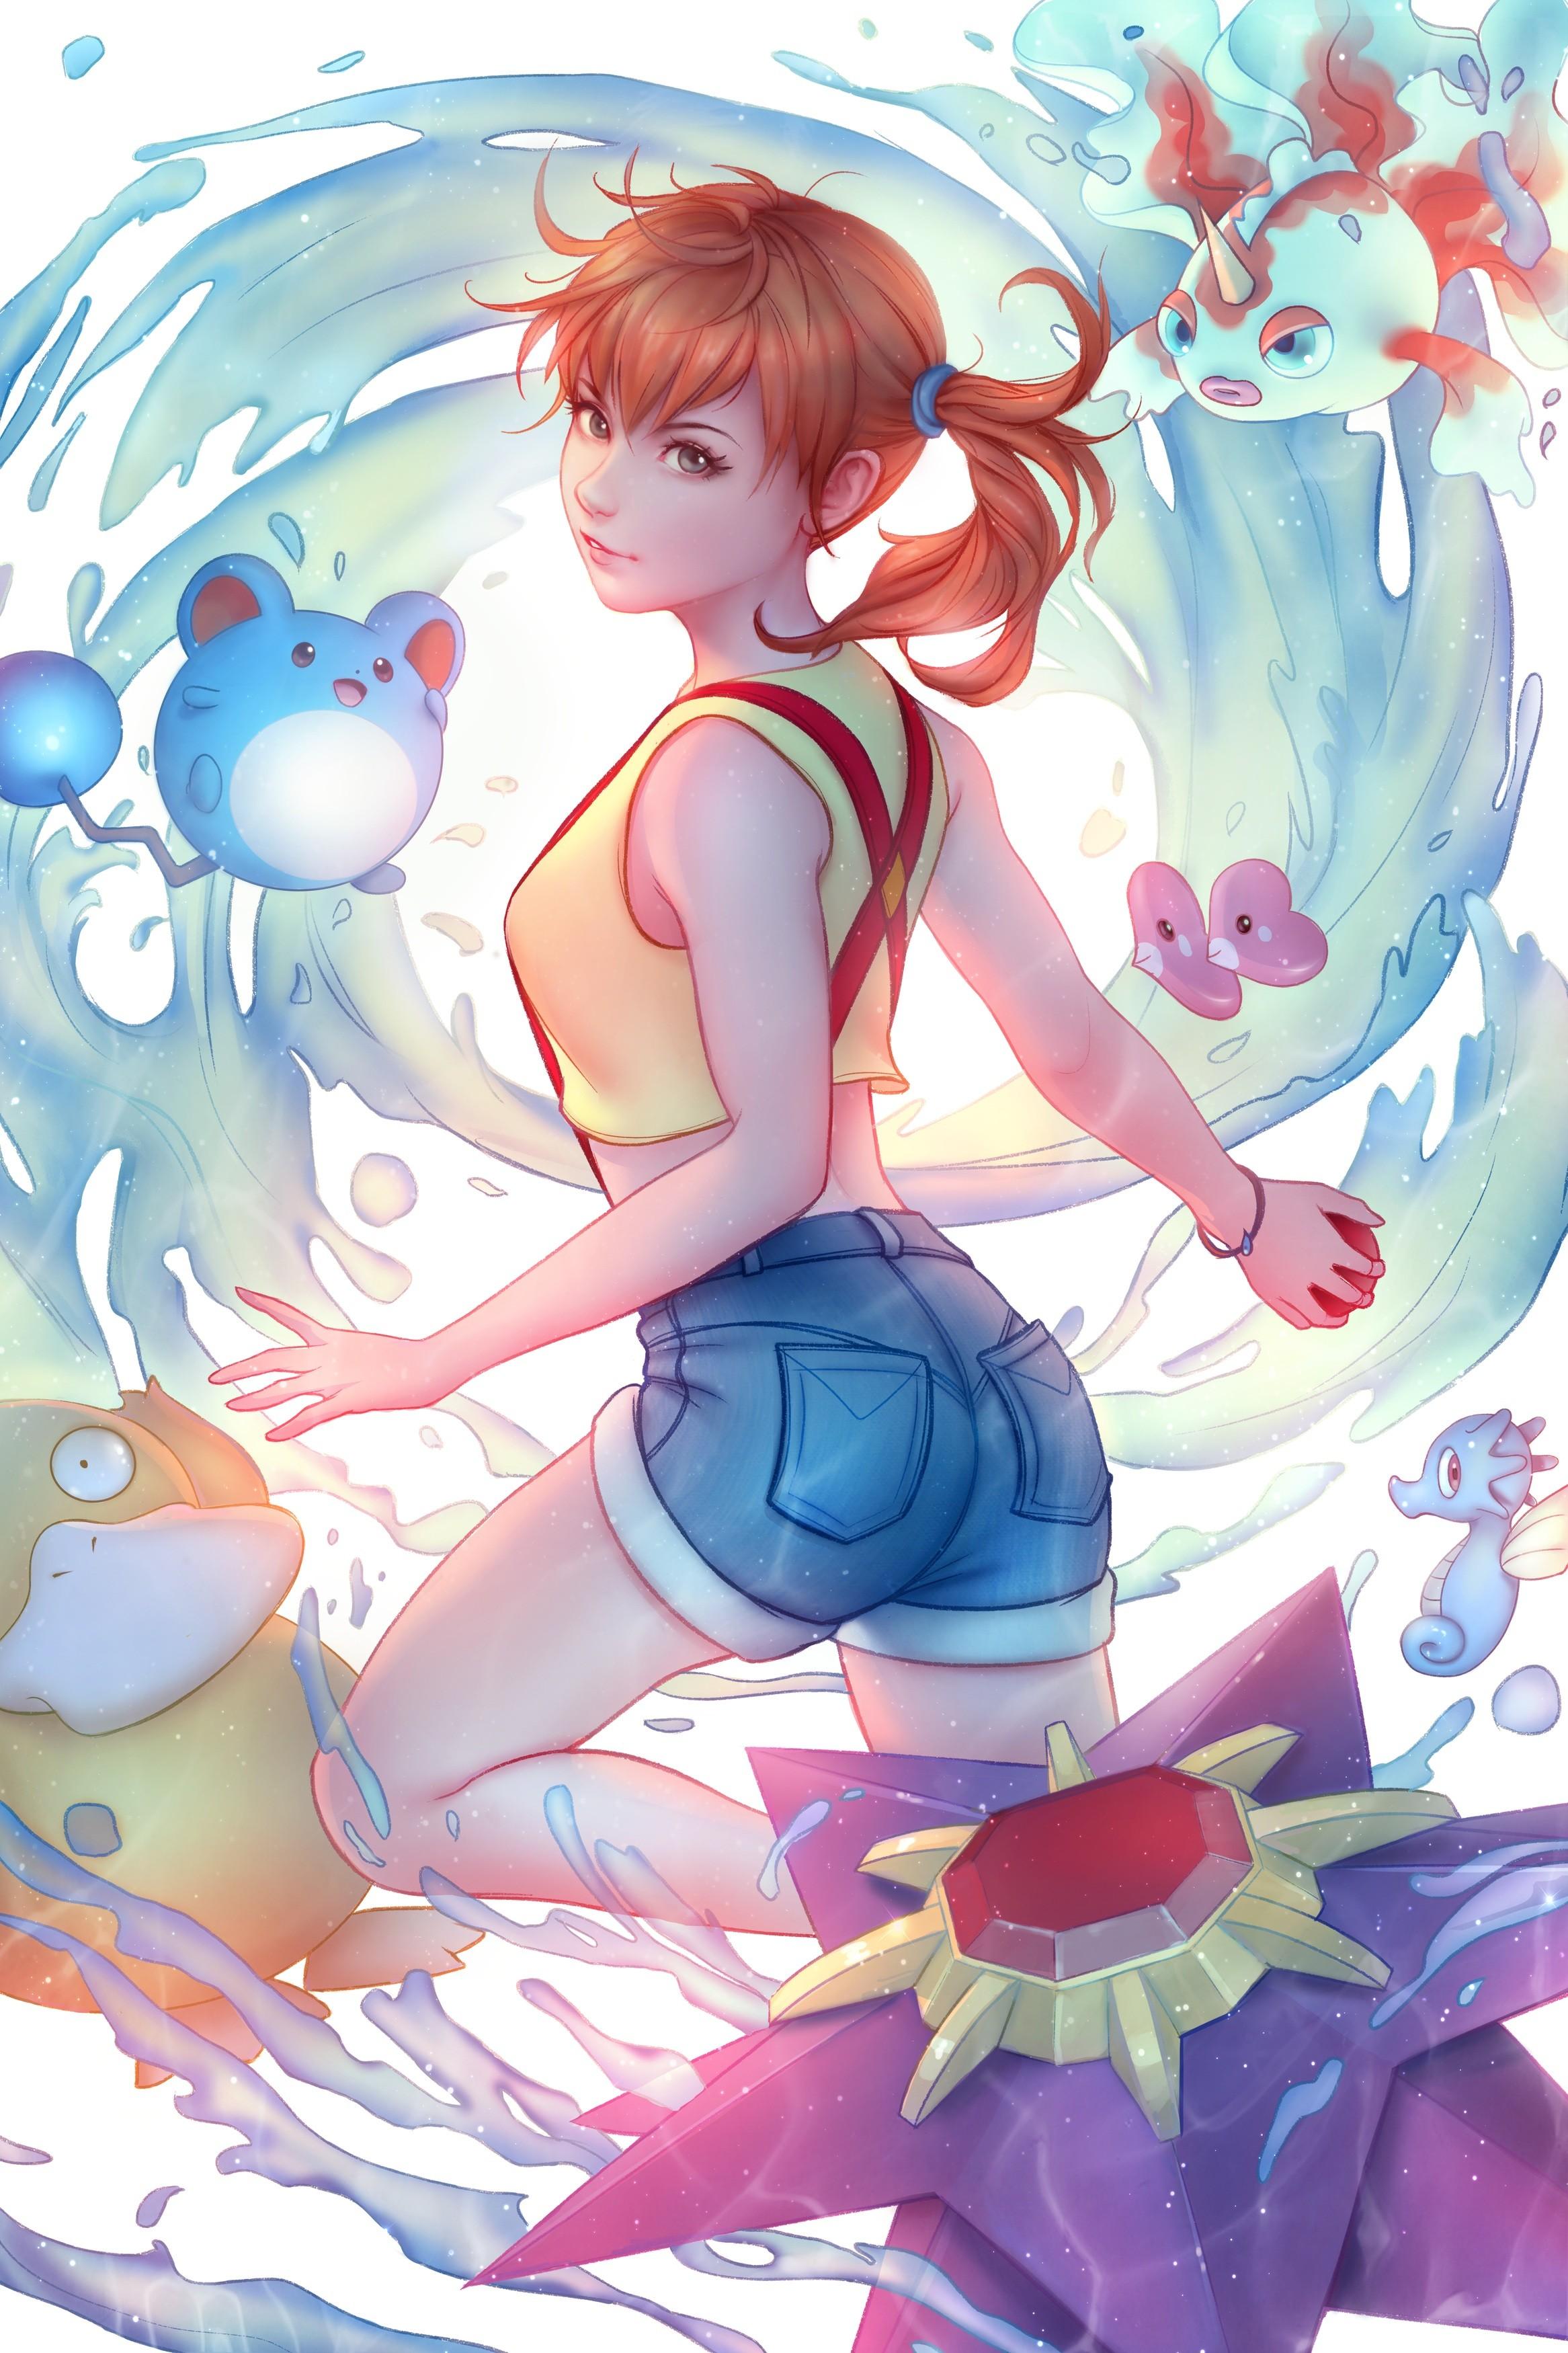 ass, redhead, legs, Jonathan Hamilton, anime, anime girls